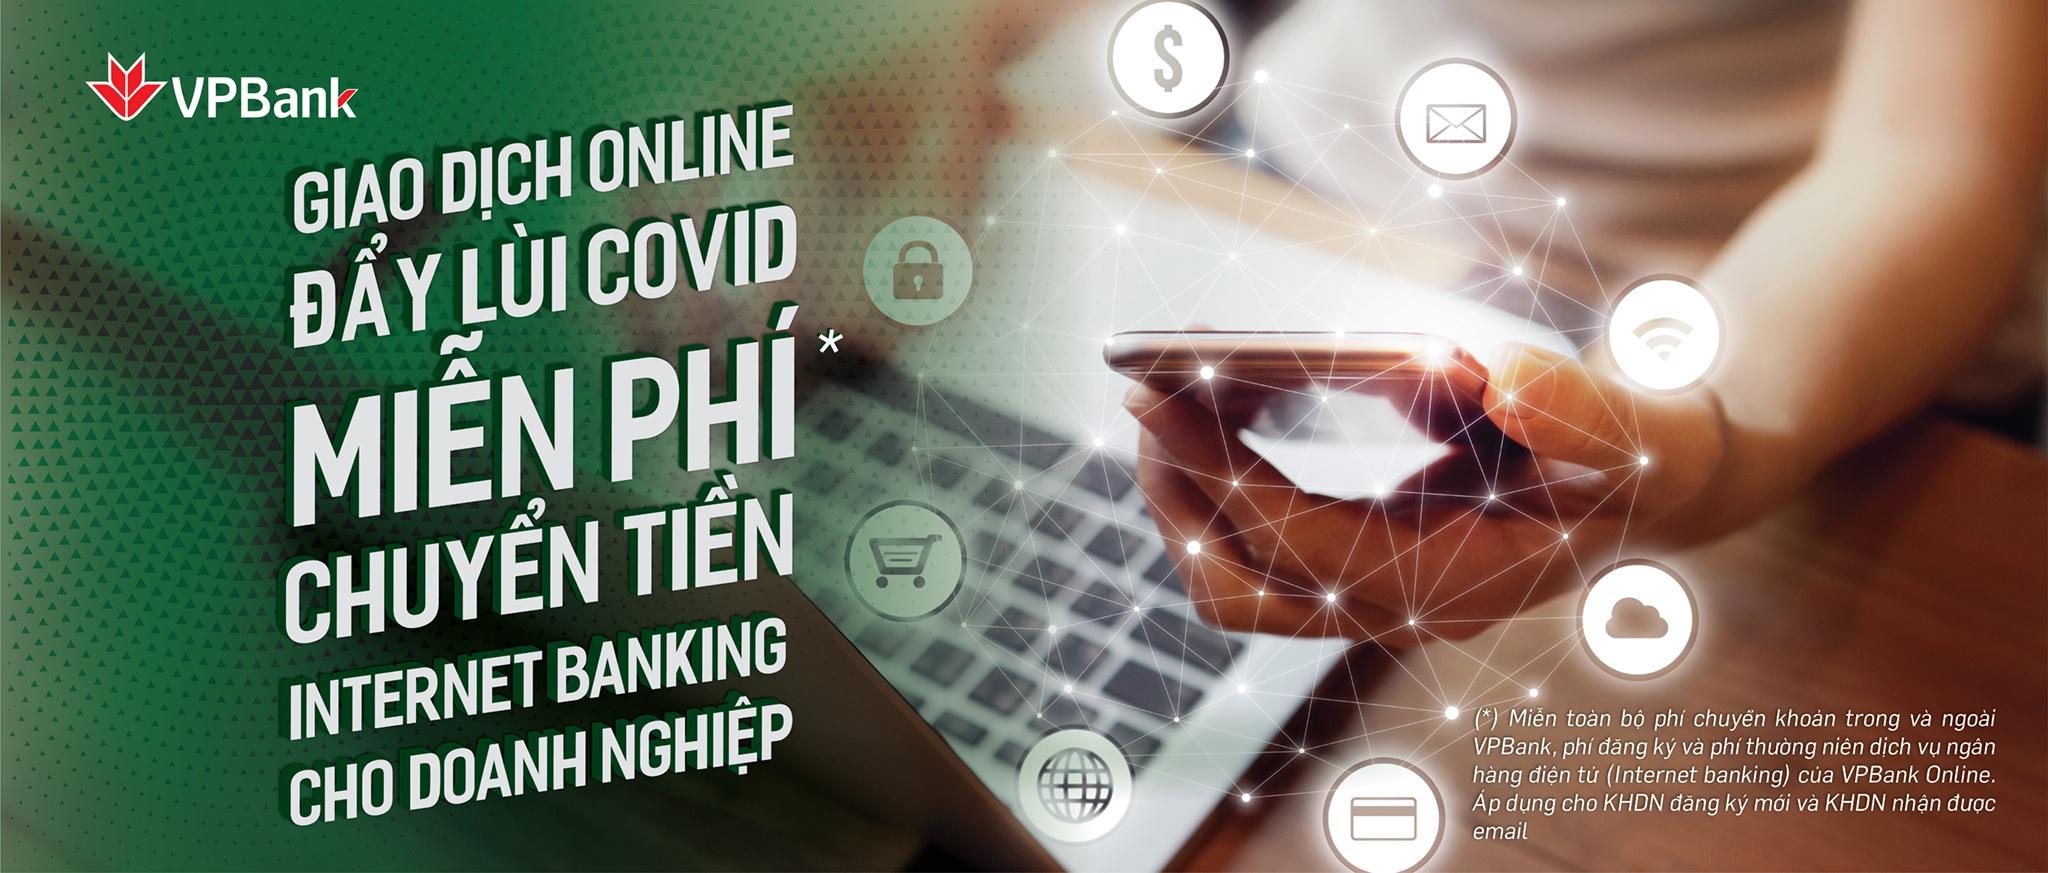 vpbank online mien hoan toan 3 loai phi cho khach hang doanh nghiep moi